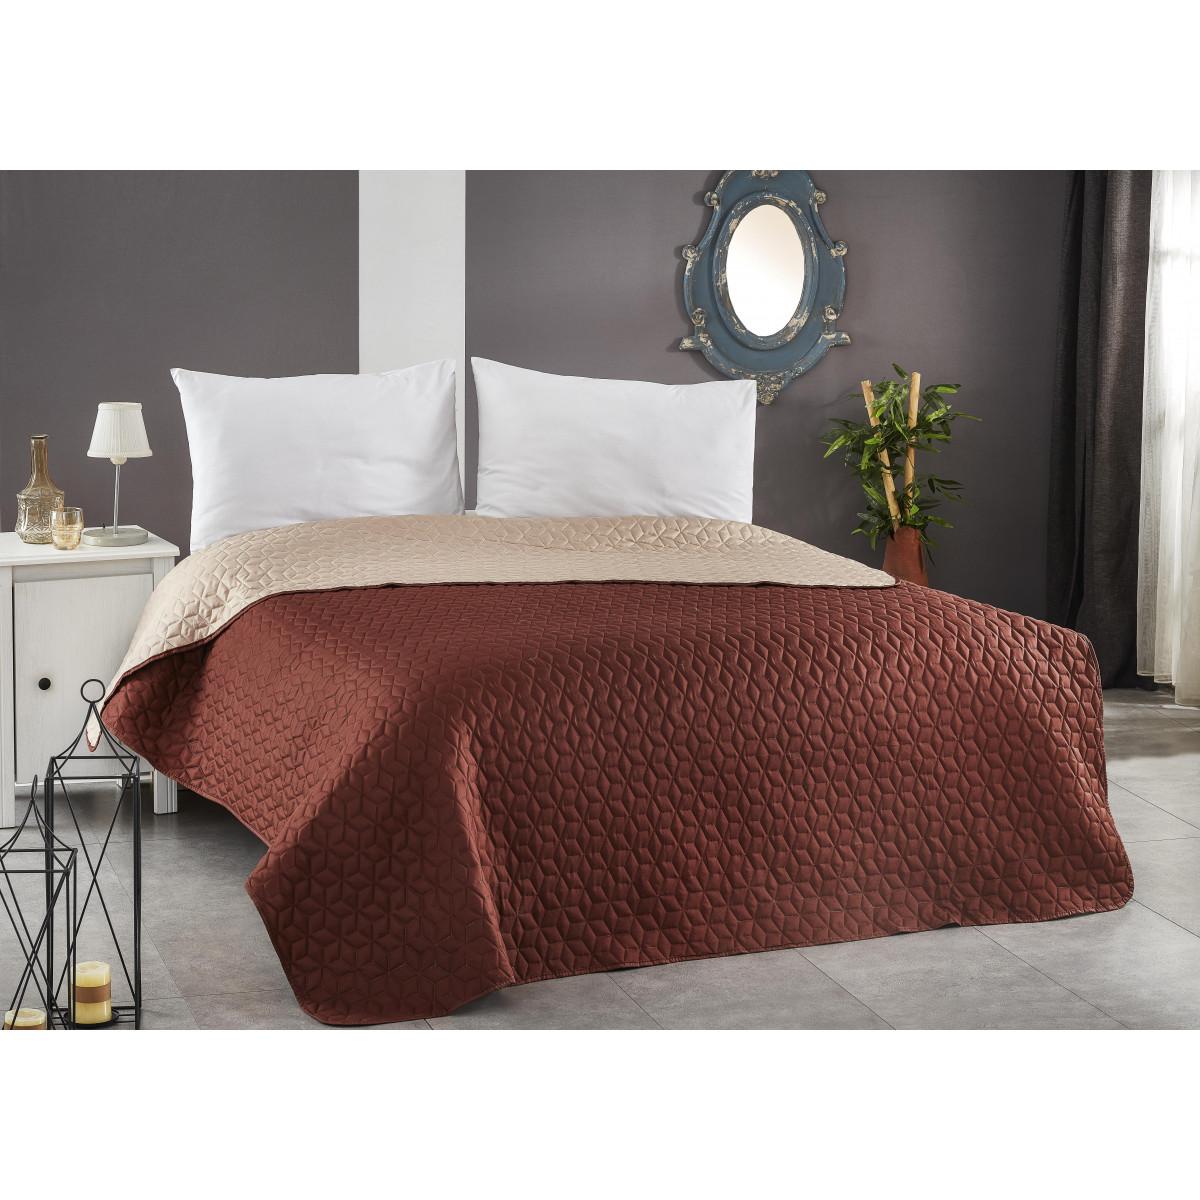 Покривало за легло ултрасоник - КАПУЧИНО